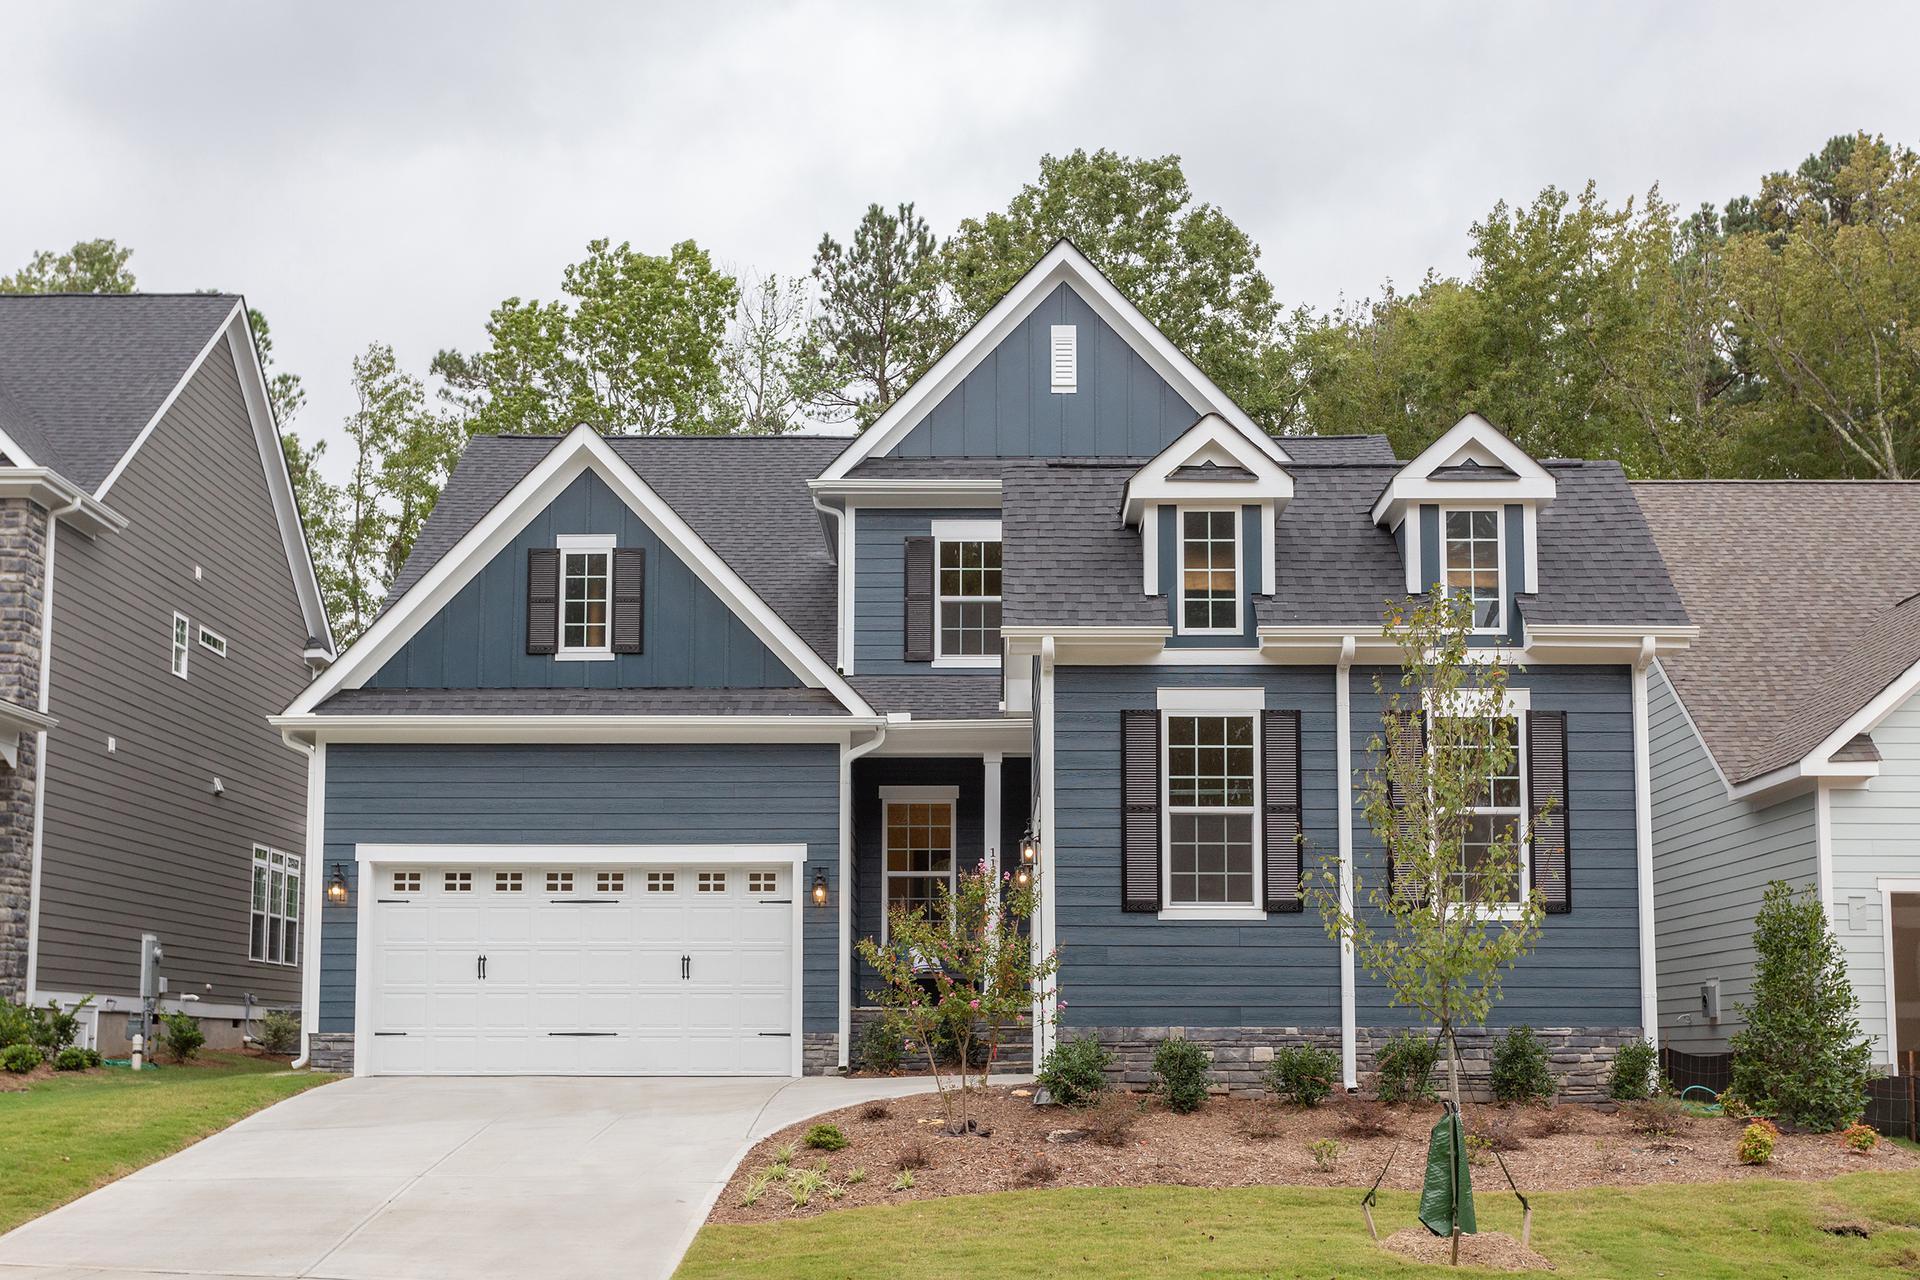 Smithfield, NC Lot for Sale